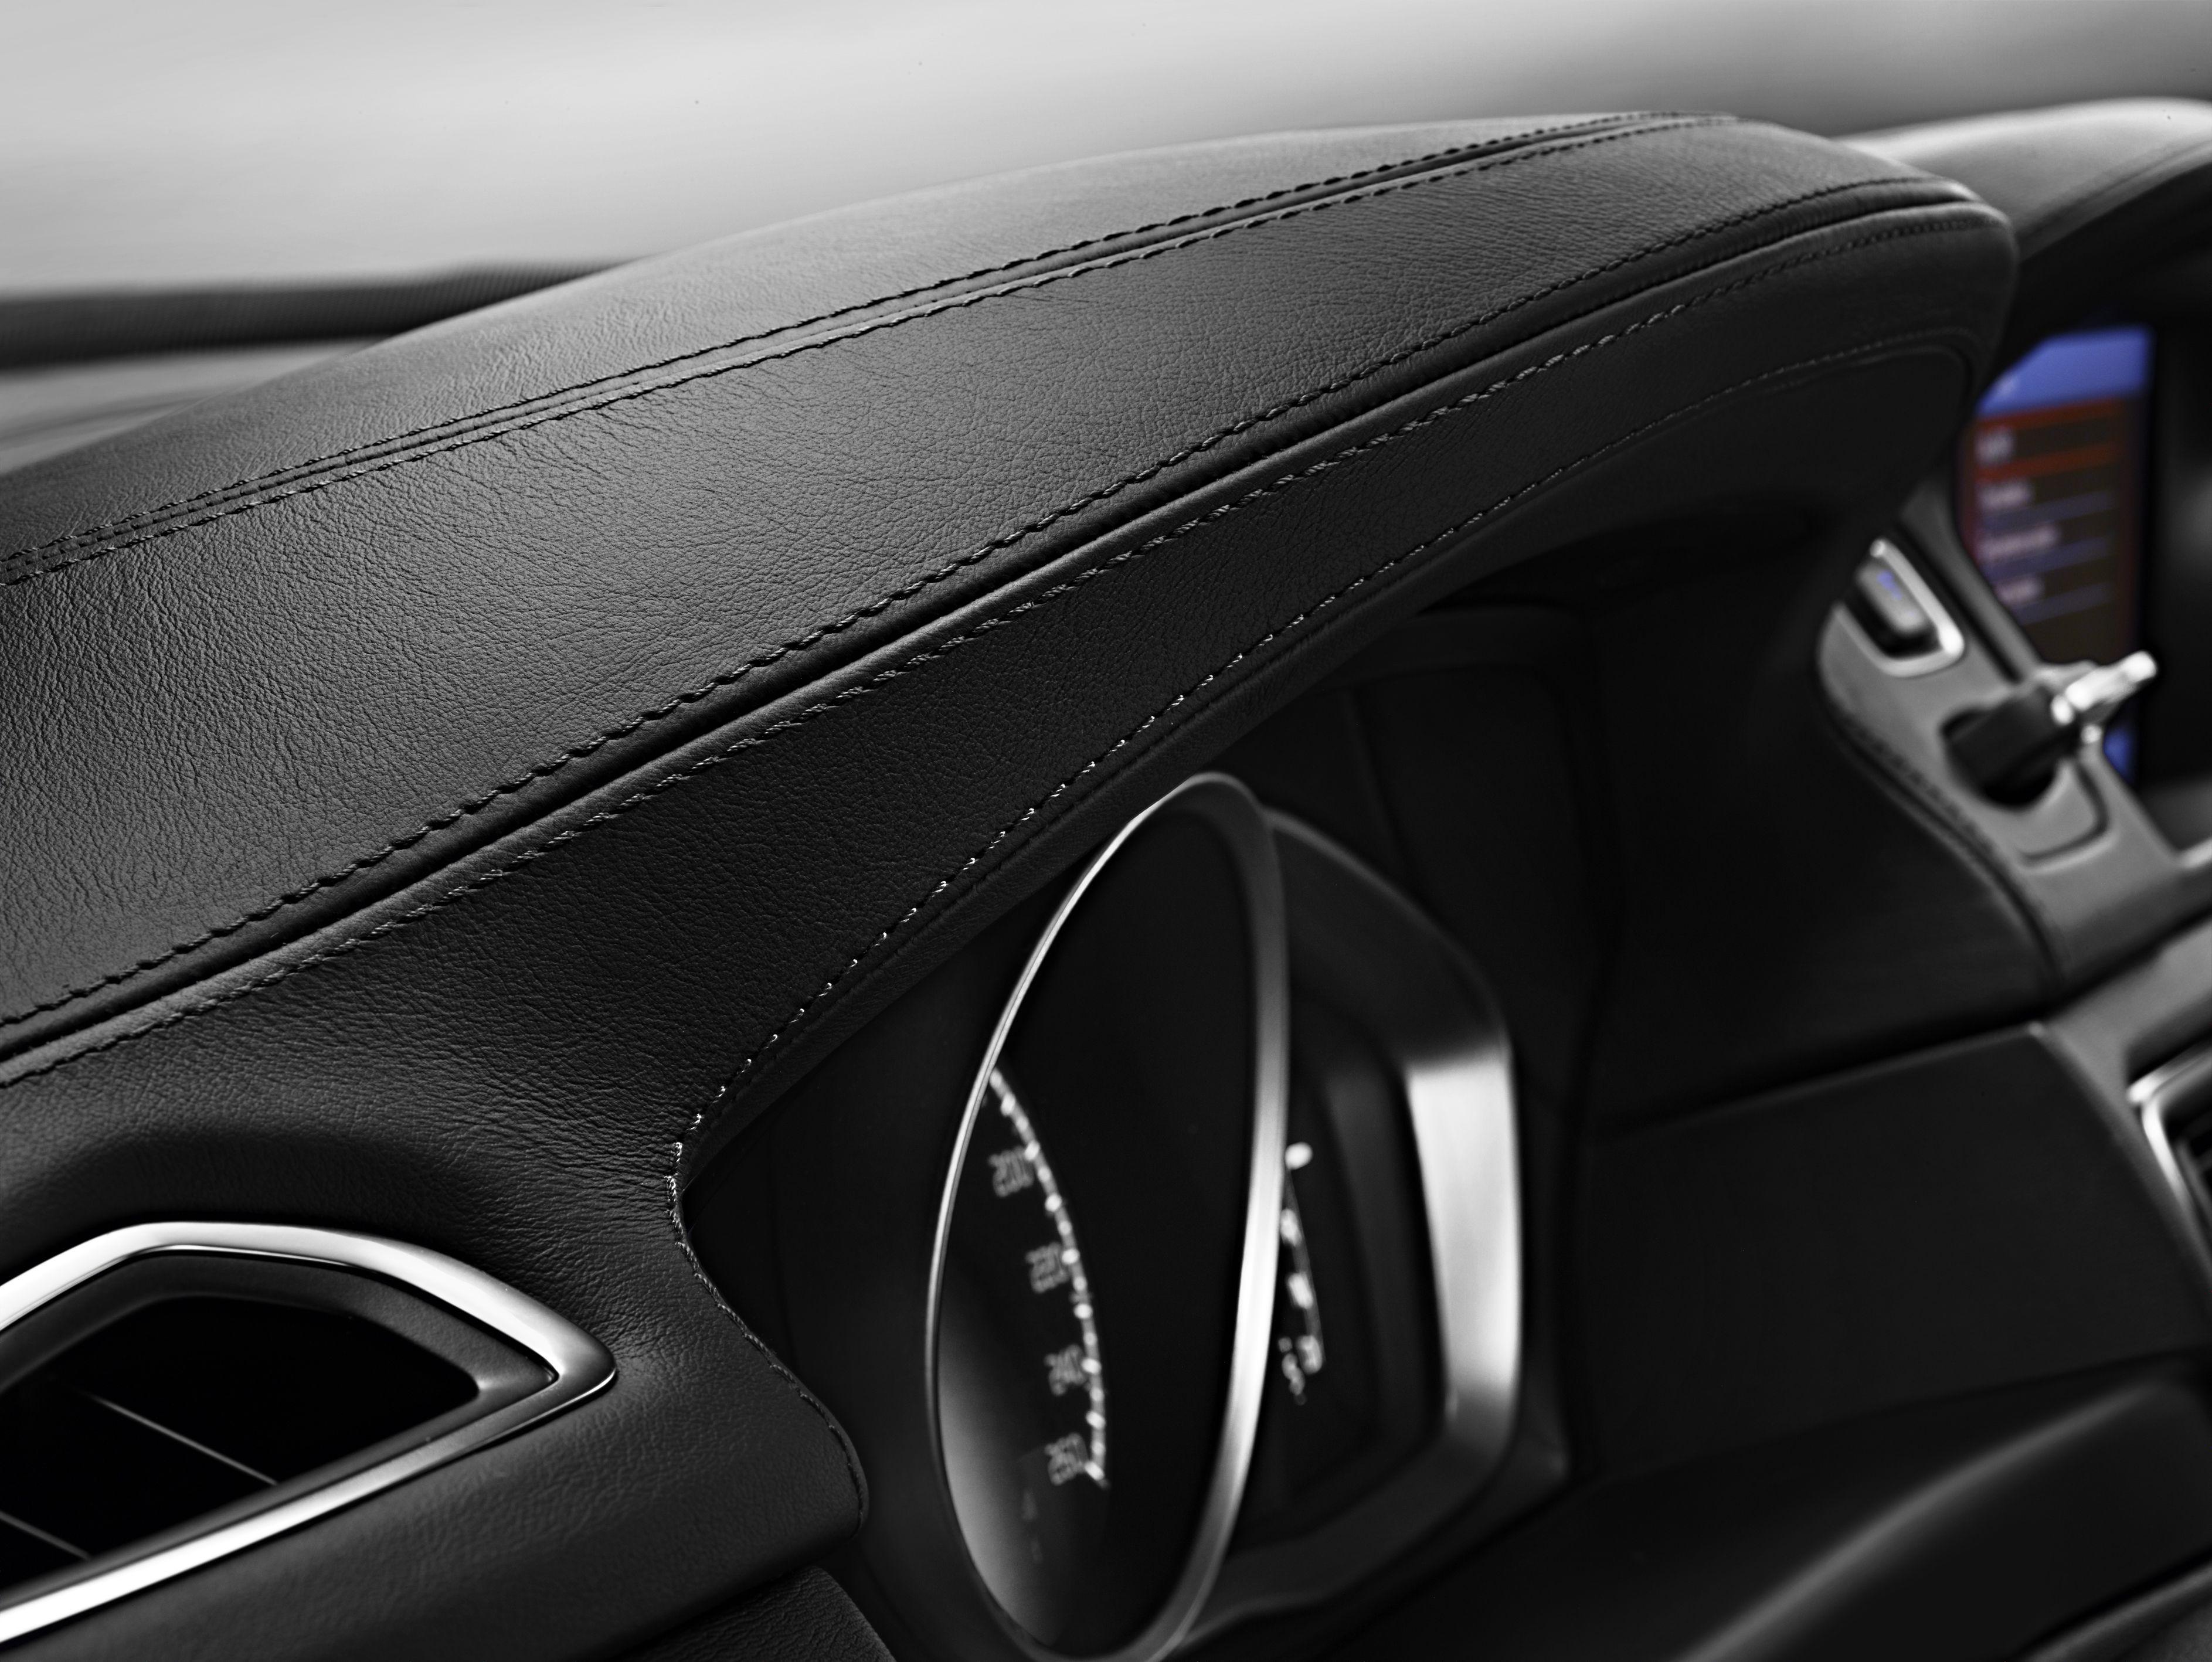 Volvo XC70 interieur | Auto upholstery Ideas & Pointers | Pinterest ...